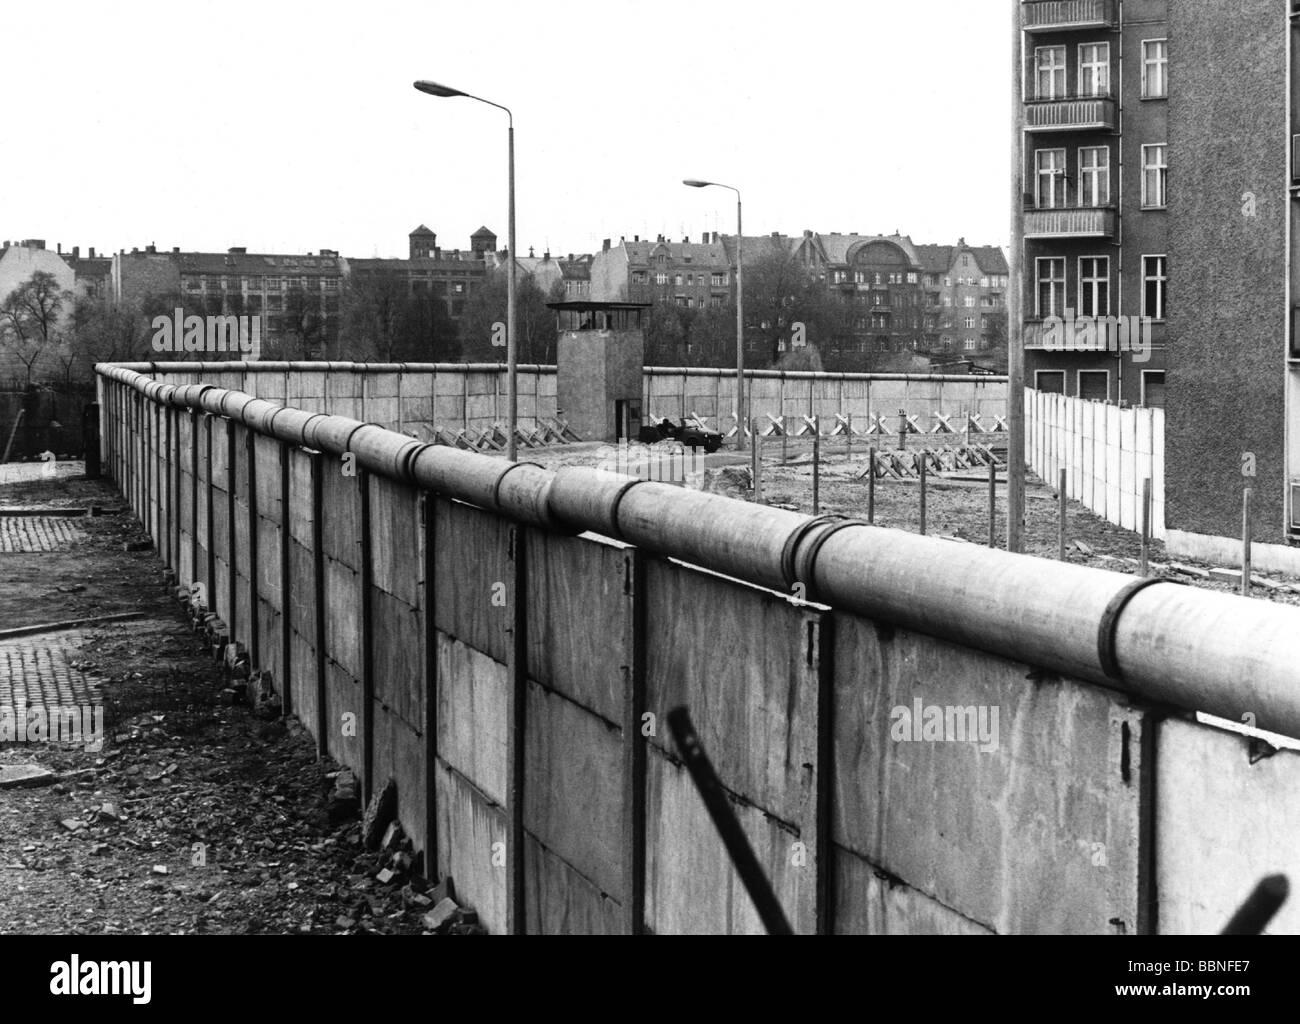 geography travel germany berlin wall at lohmuehlplatz stock photo royalty free image. Black Bedroom Furniture Sets. Home Design Ideas